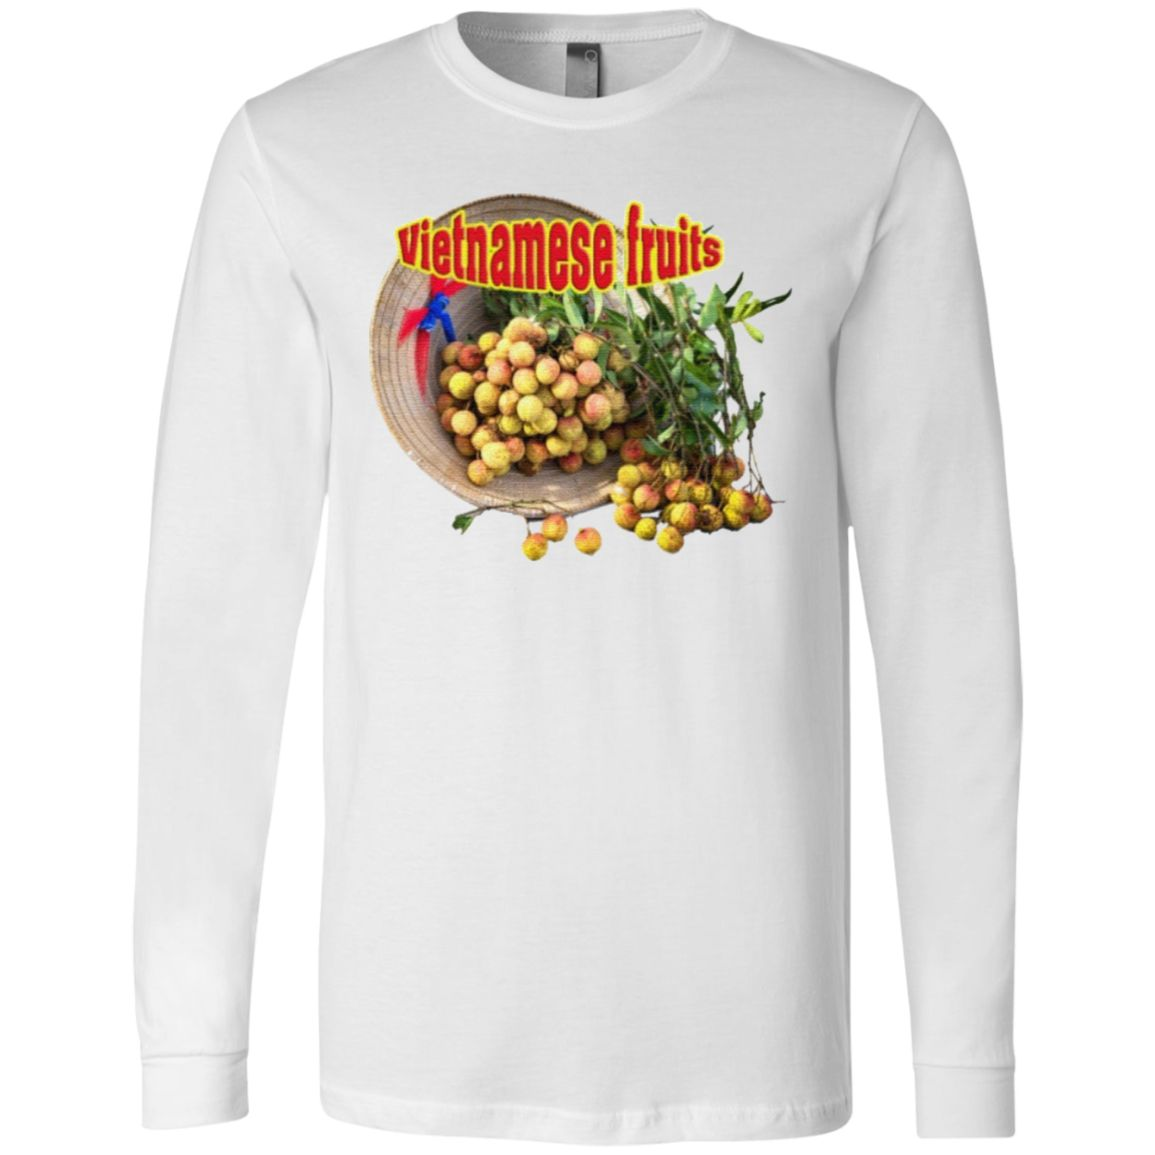 Vietnamese fruits Premium t shirt